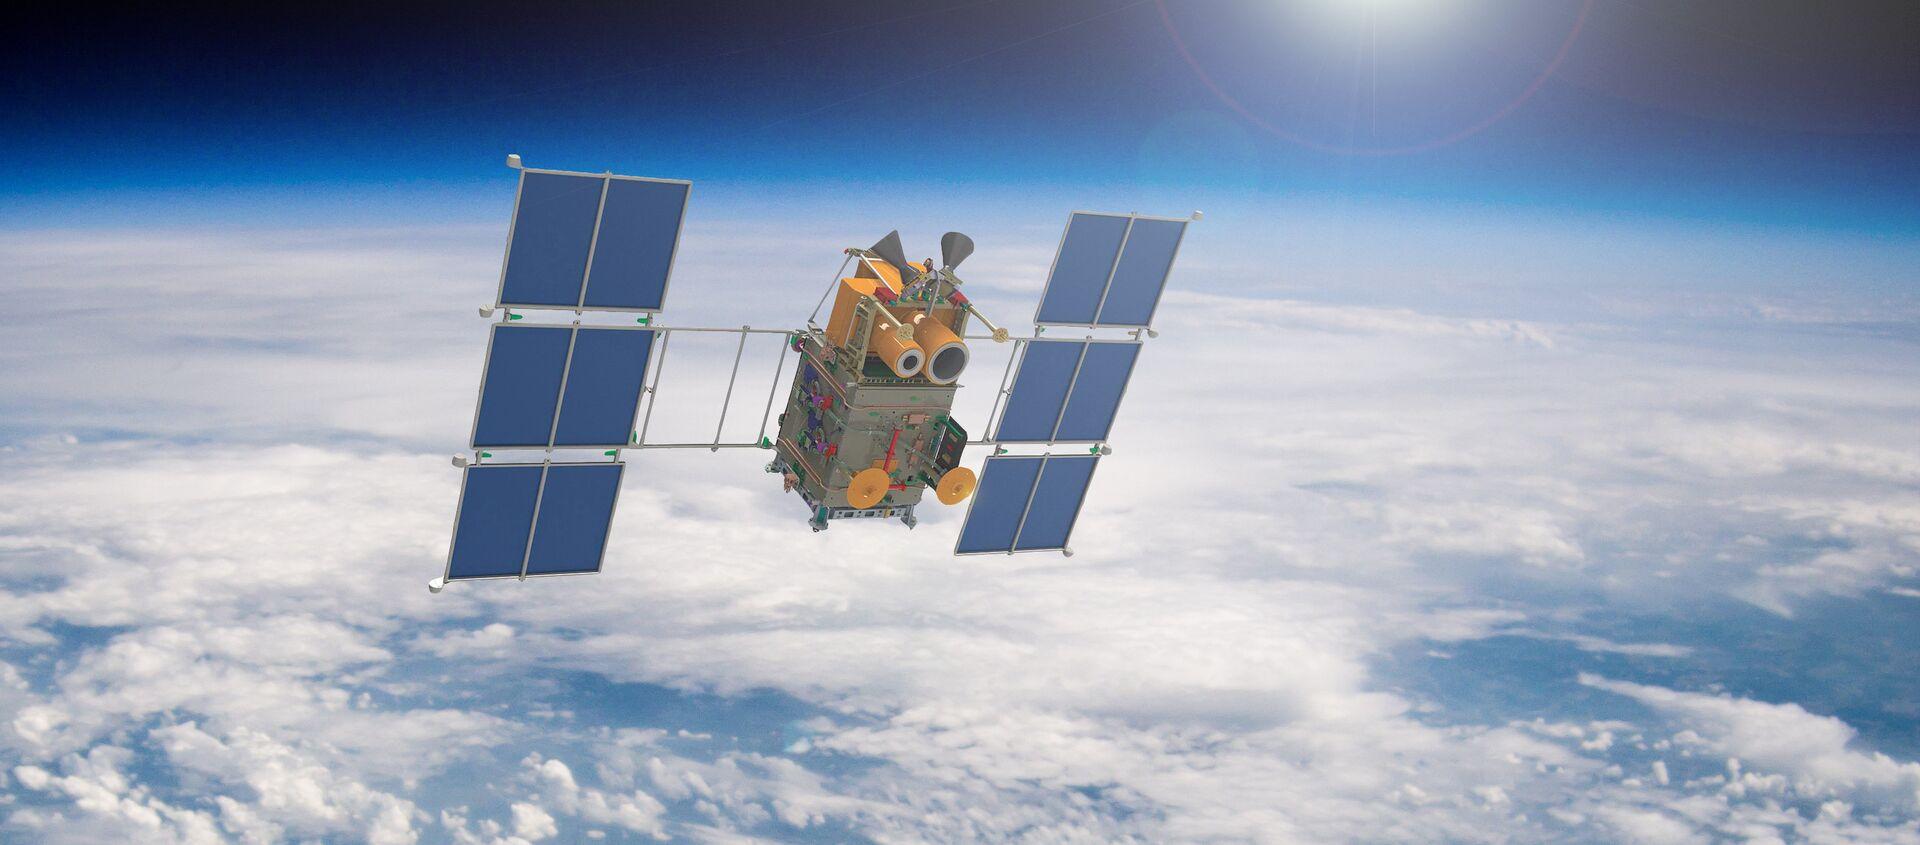 Il satellite russo Canopus-B - Sputnik Italia, 1920, 27.08.2019